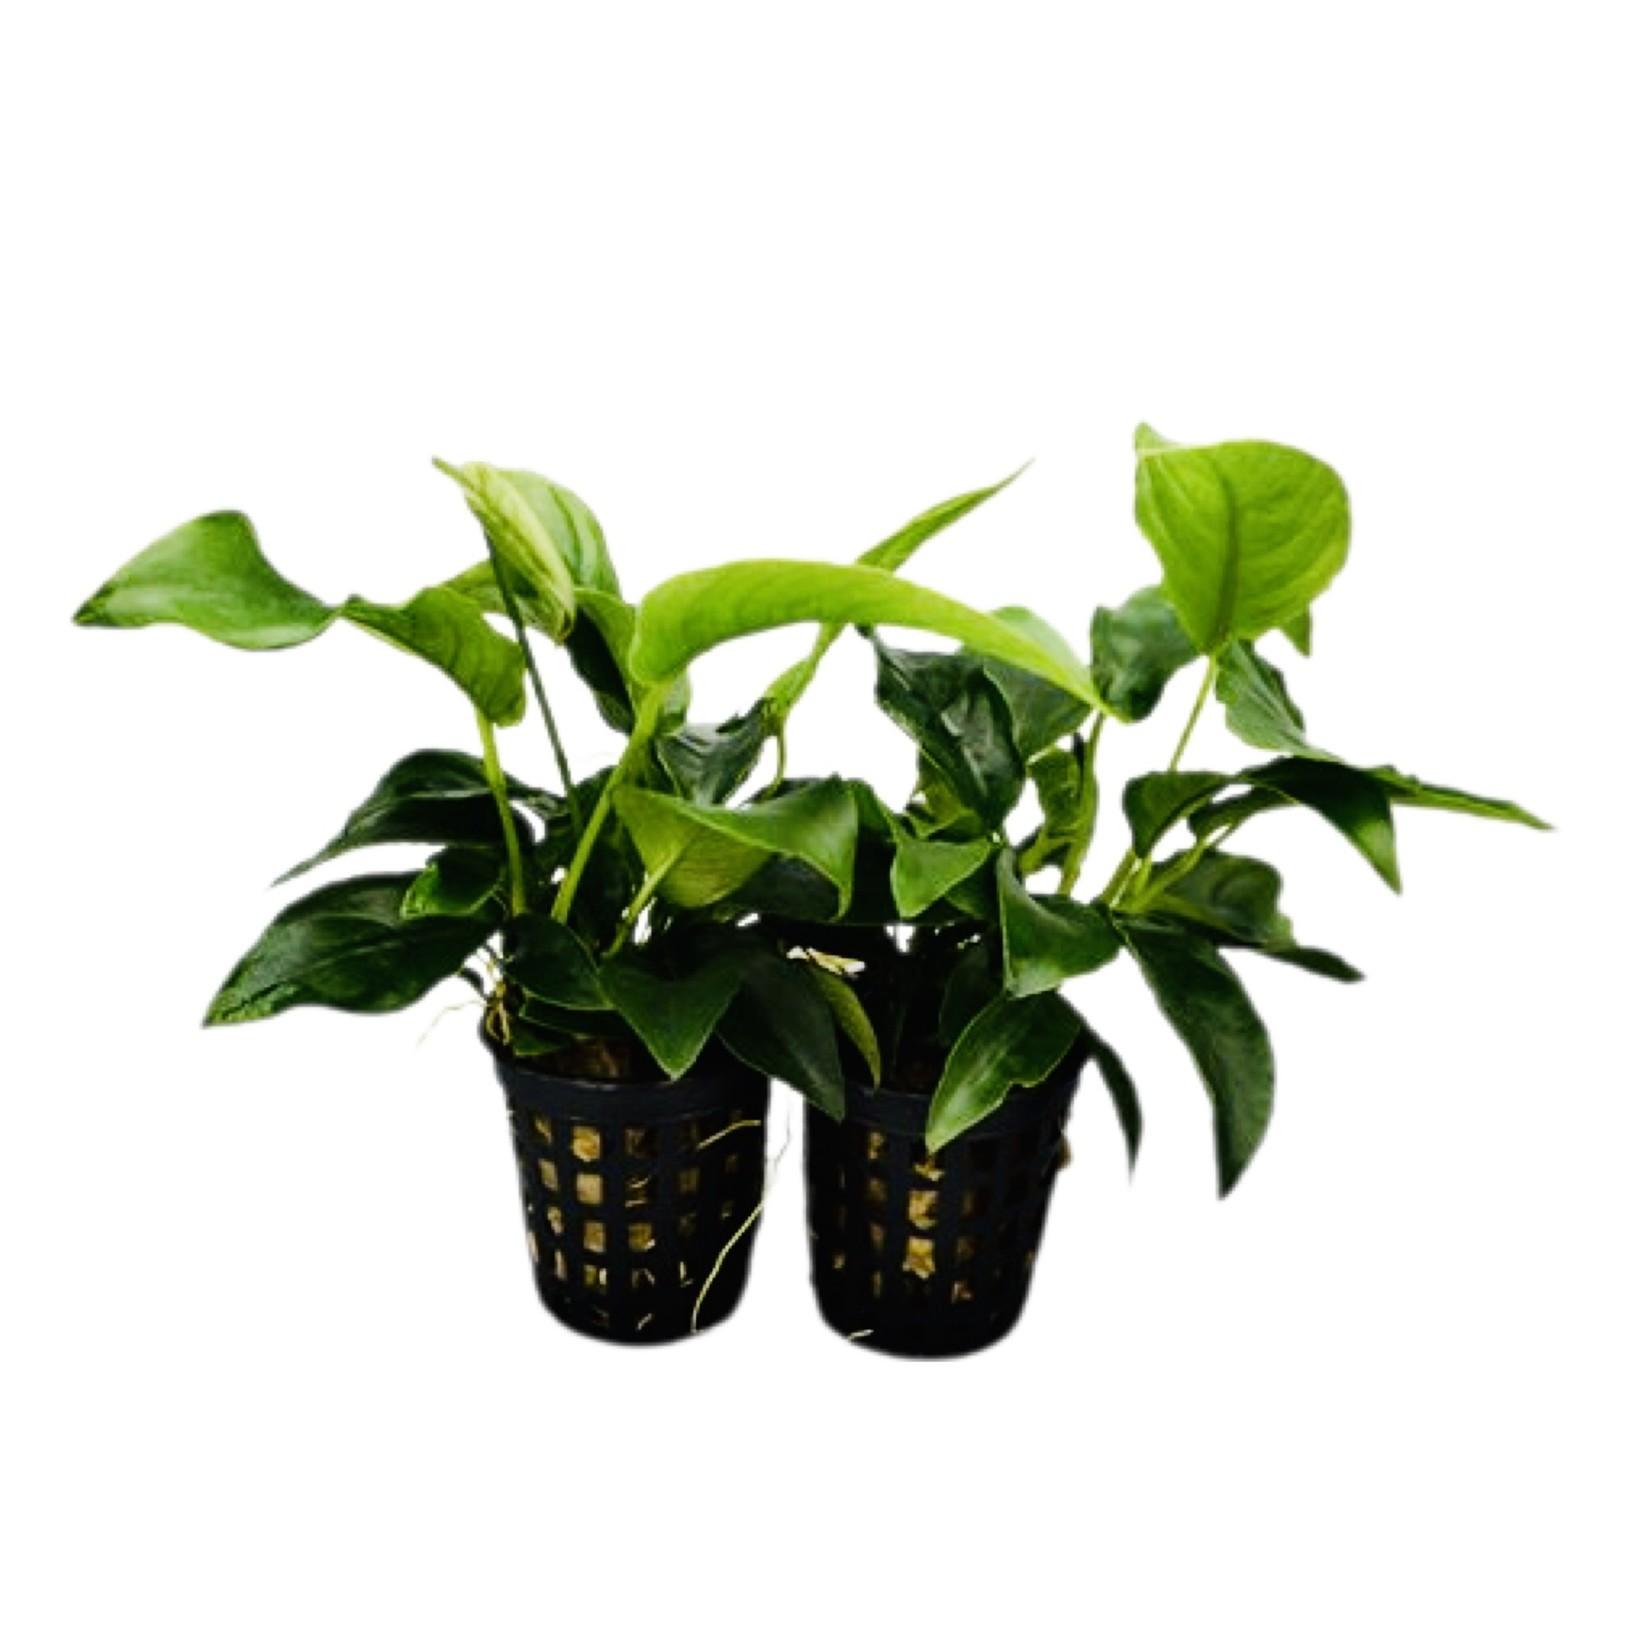 Bubba's Plants Anubias nana mini